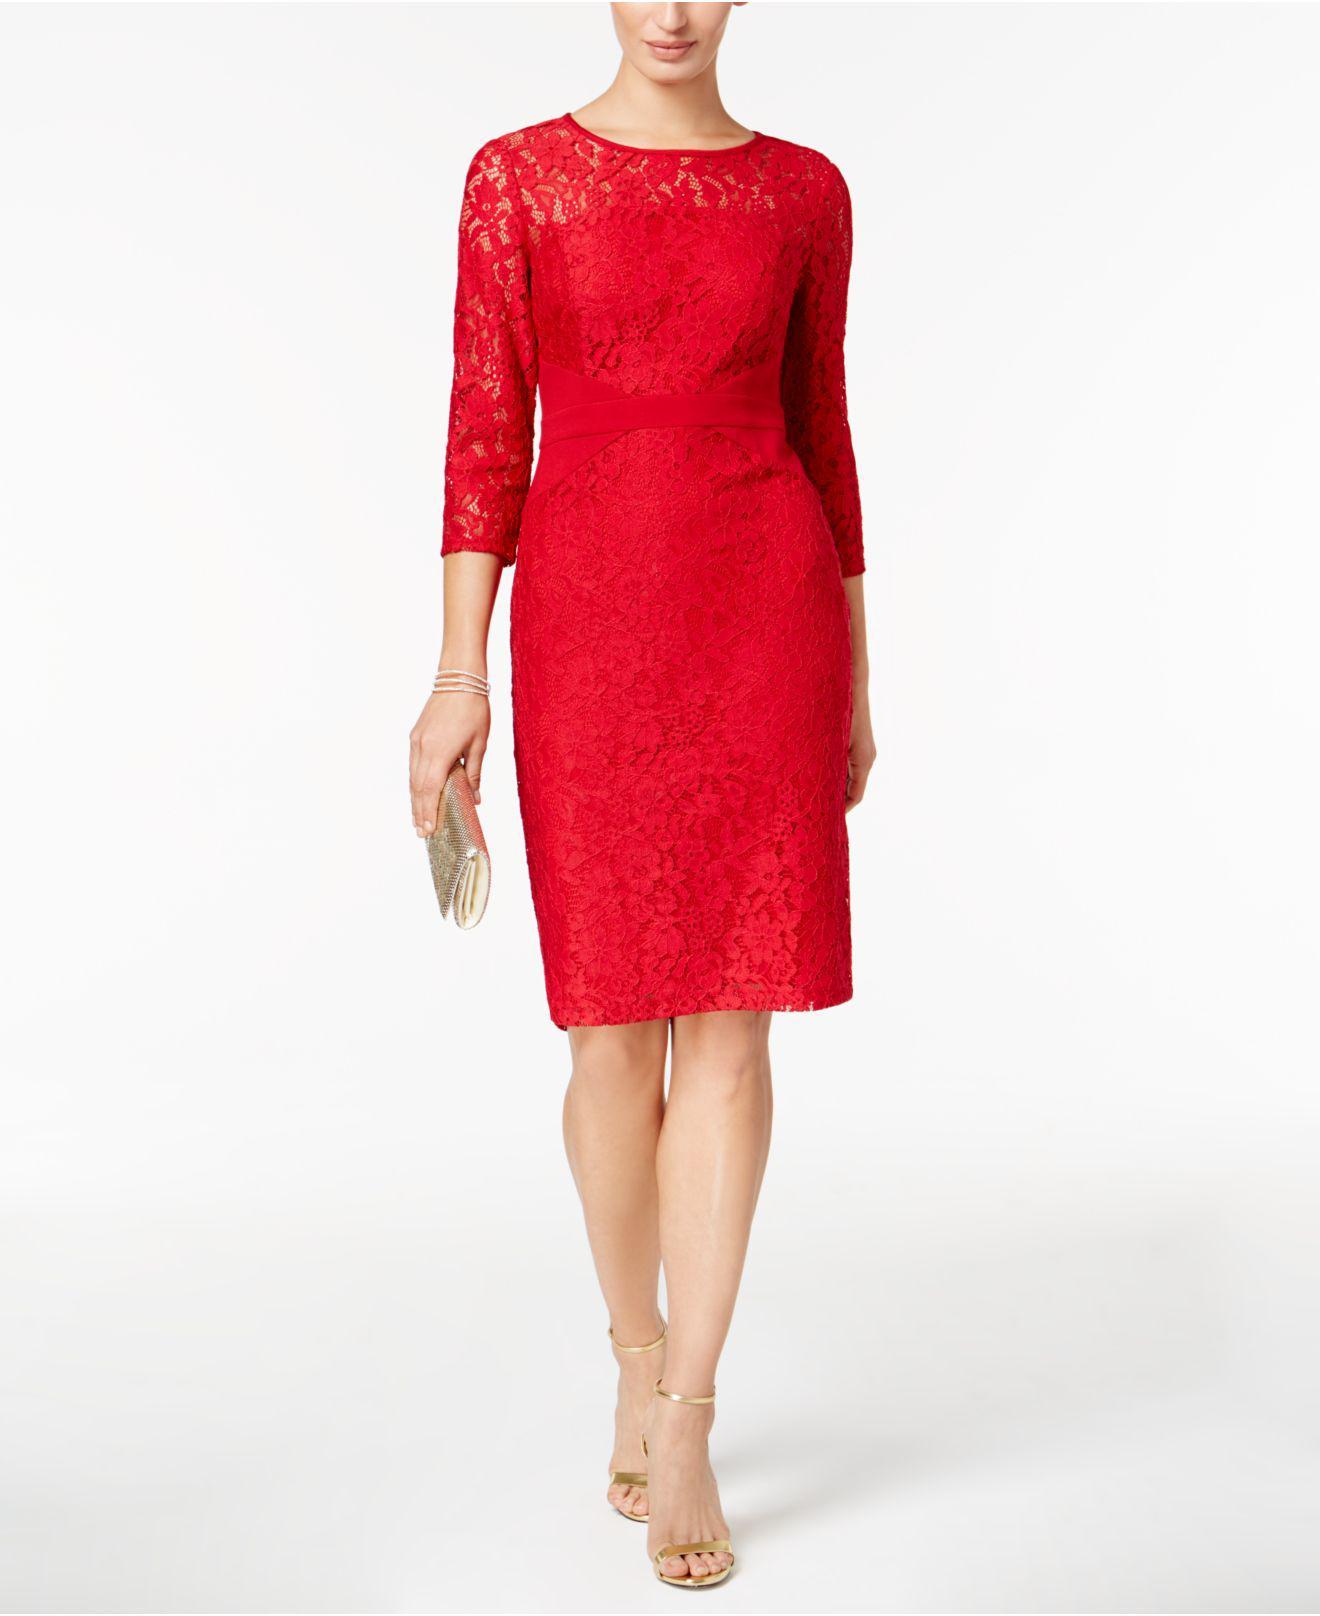 65954174 Lyst - Nine West Lace Sheath Dress in Red